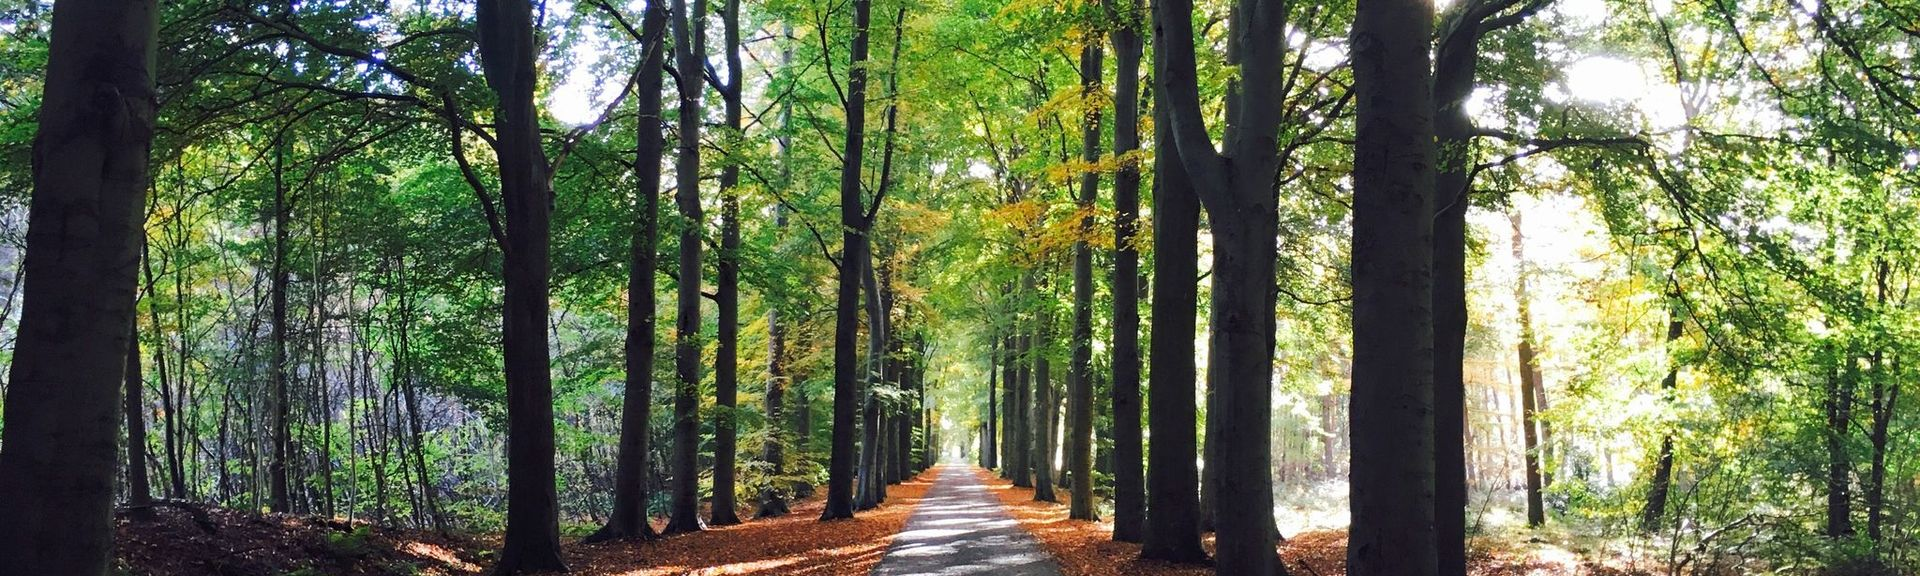 Doldersum, Netherlands